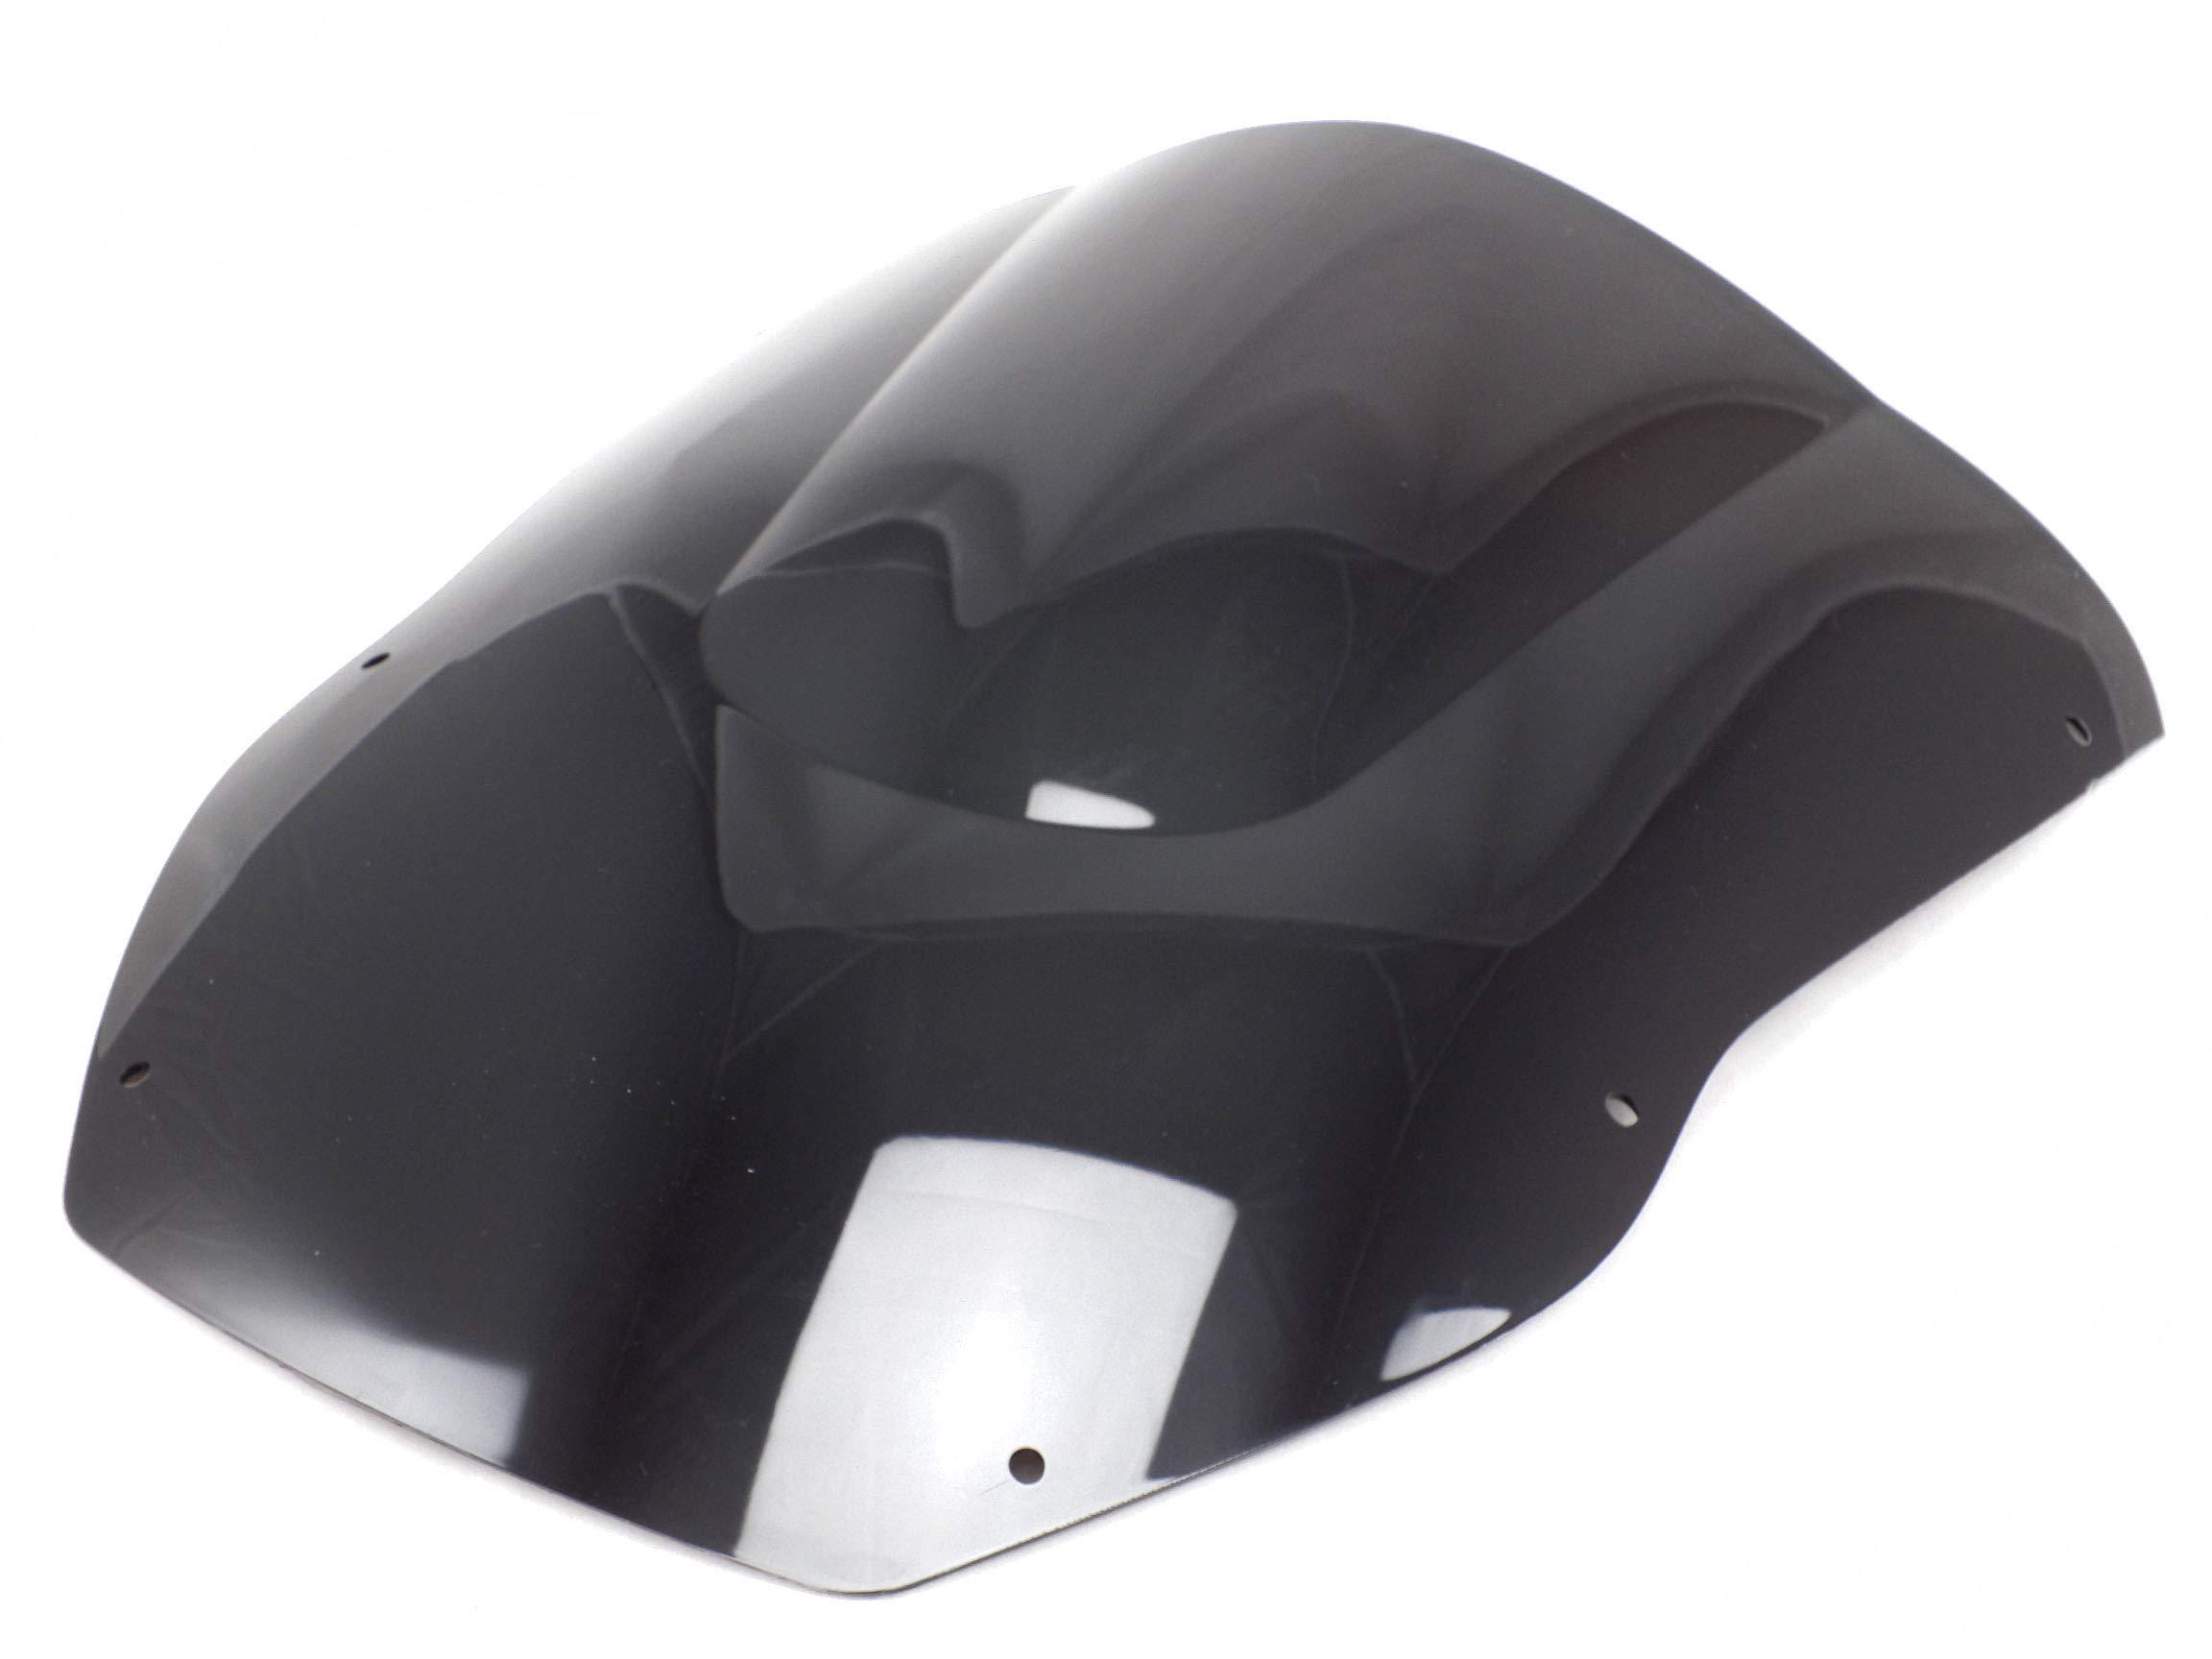 Motorcycle Double Bubble ABS Windshield Windscreen Screen Protector Wind Deflectors Shield for Kawasaki ZX-12R 2000-2001